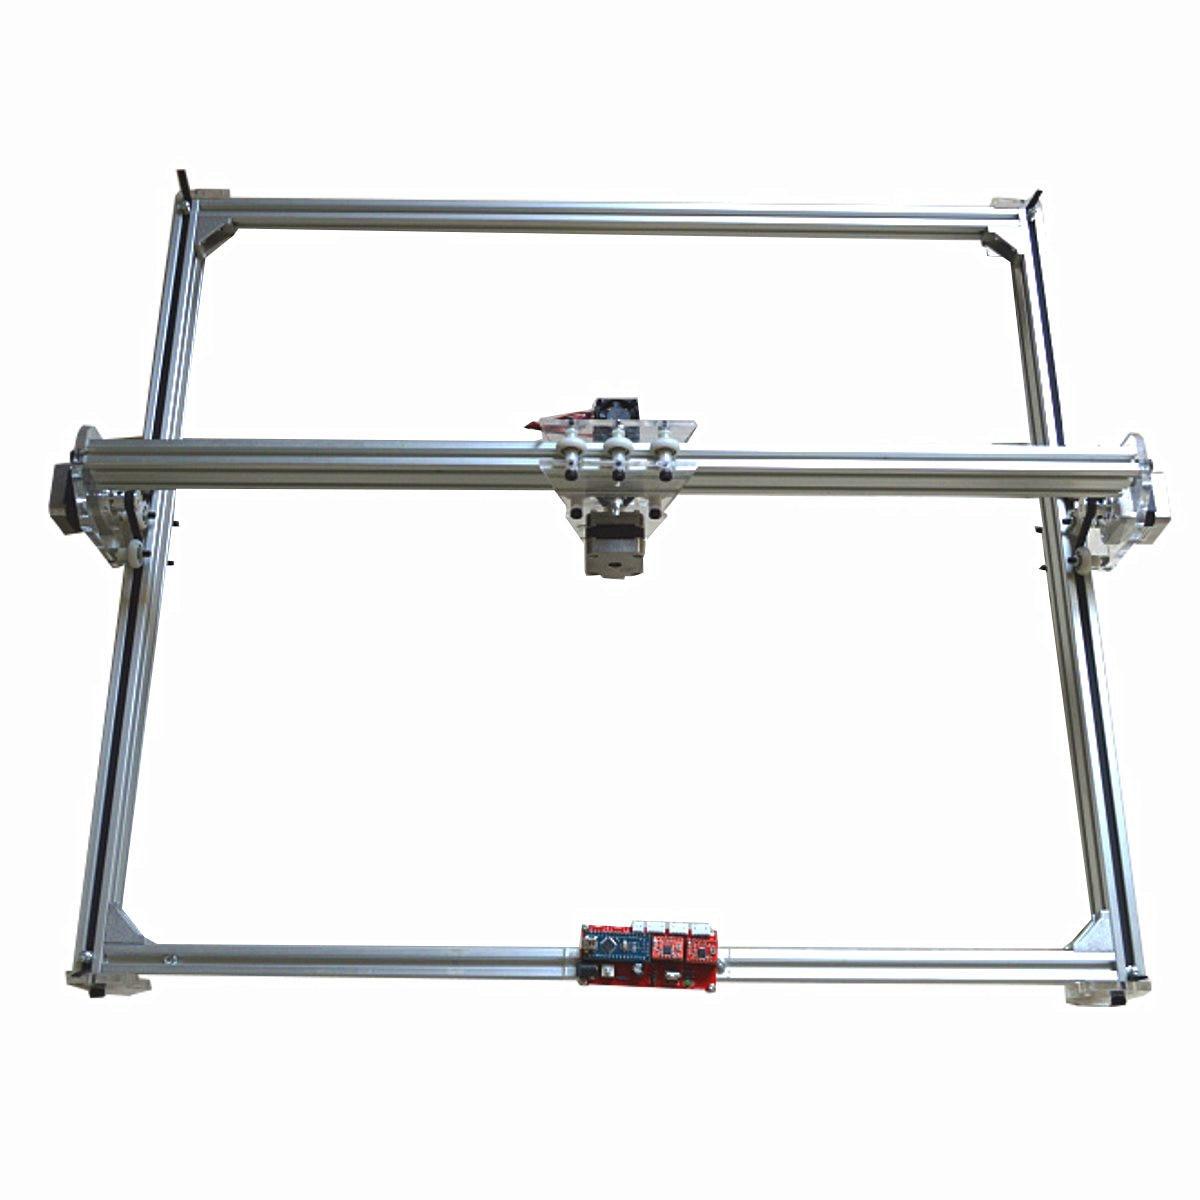 100mw-5500mw 65x50cm DIY Desktop Mini Laser Cutting/Engraving Engraver Machine DC 12V Wood Cutter/Printer/Power Adjustable